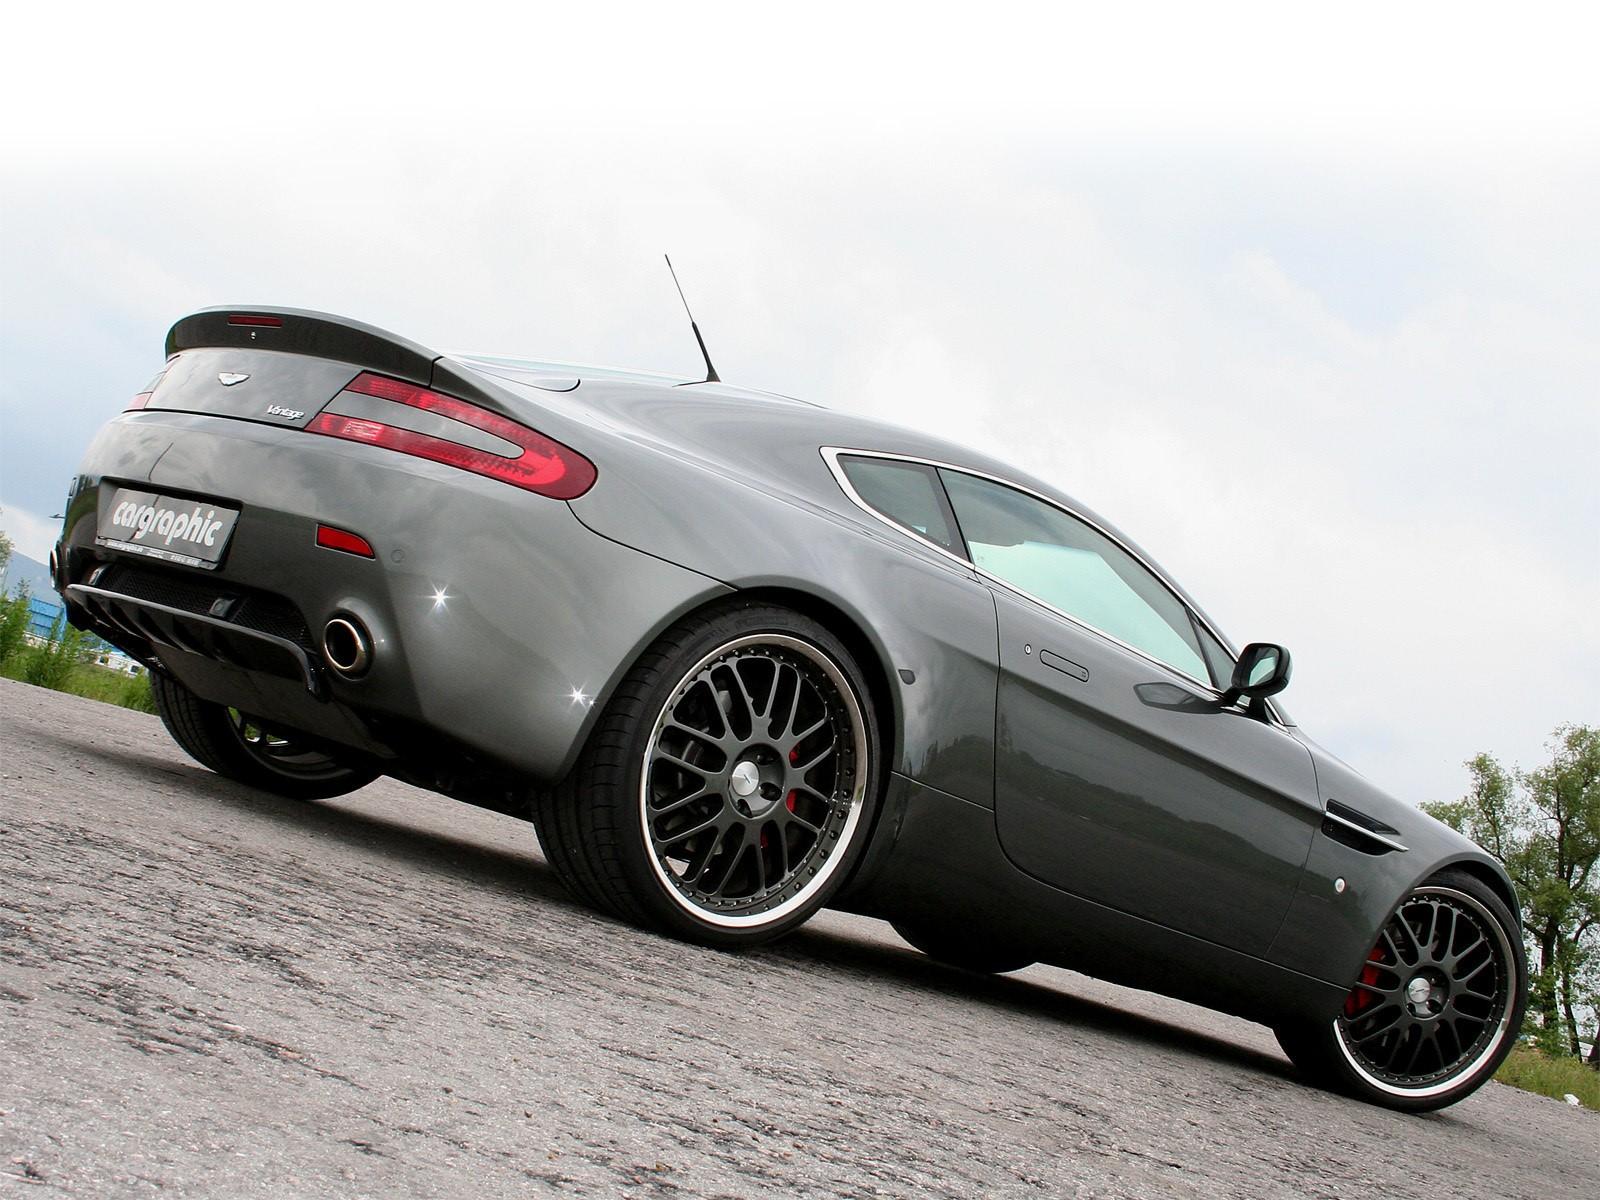 2009 Cargraphic - Aston Martin V8 Vantage